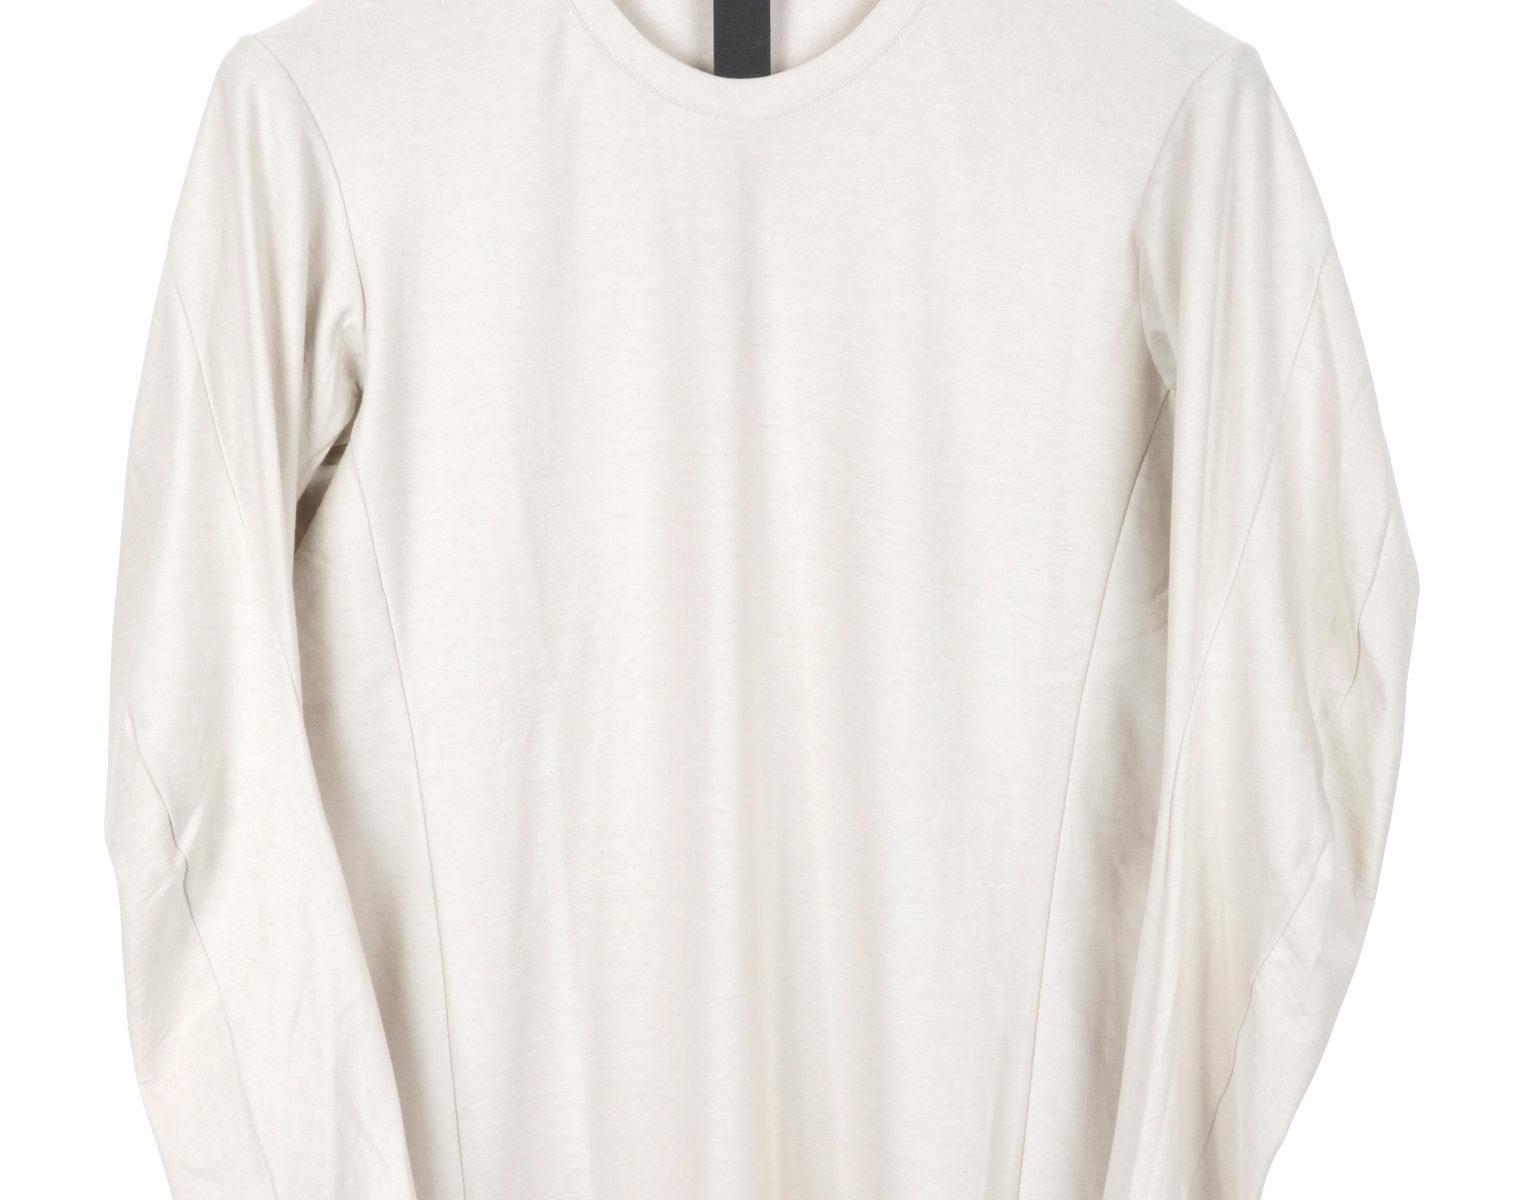 DEVOA Long Shirt white grey 1